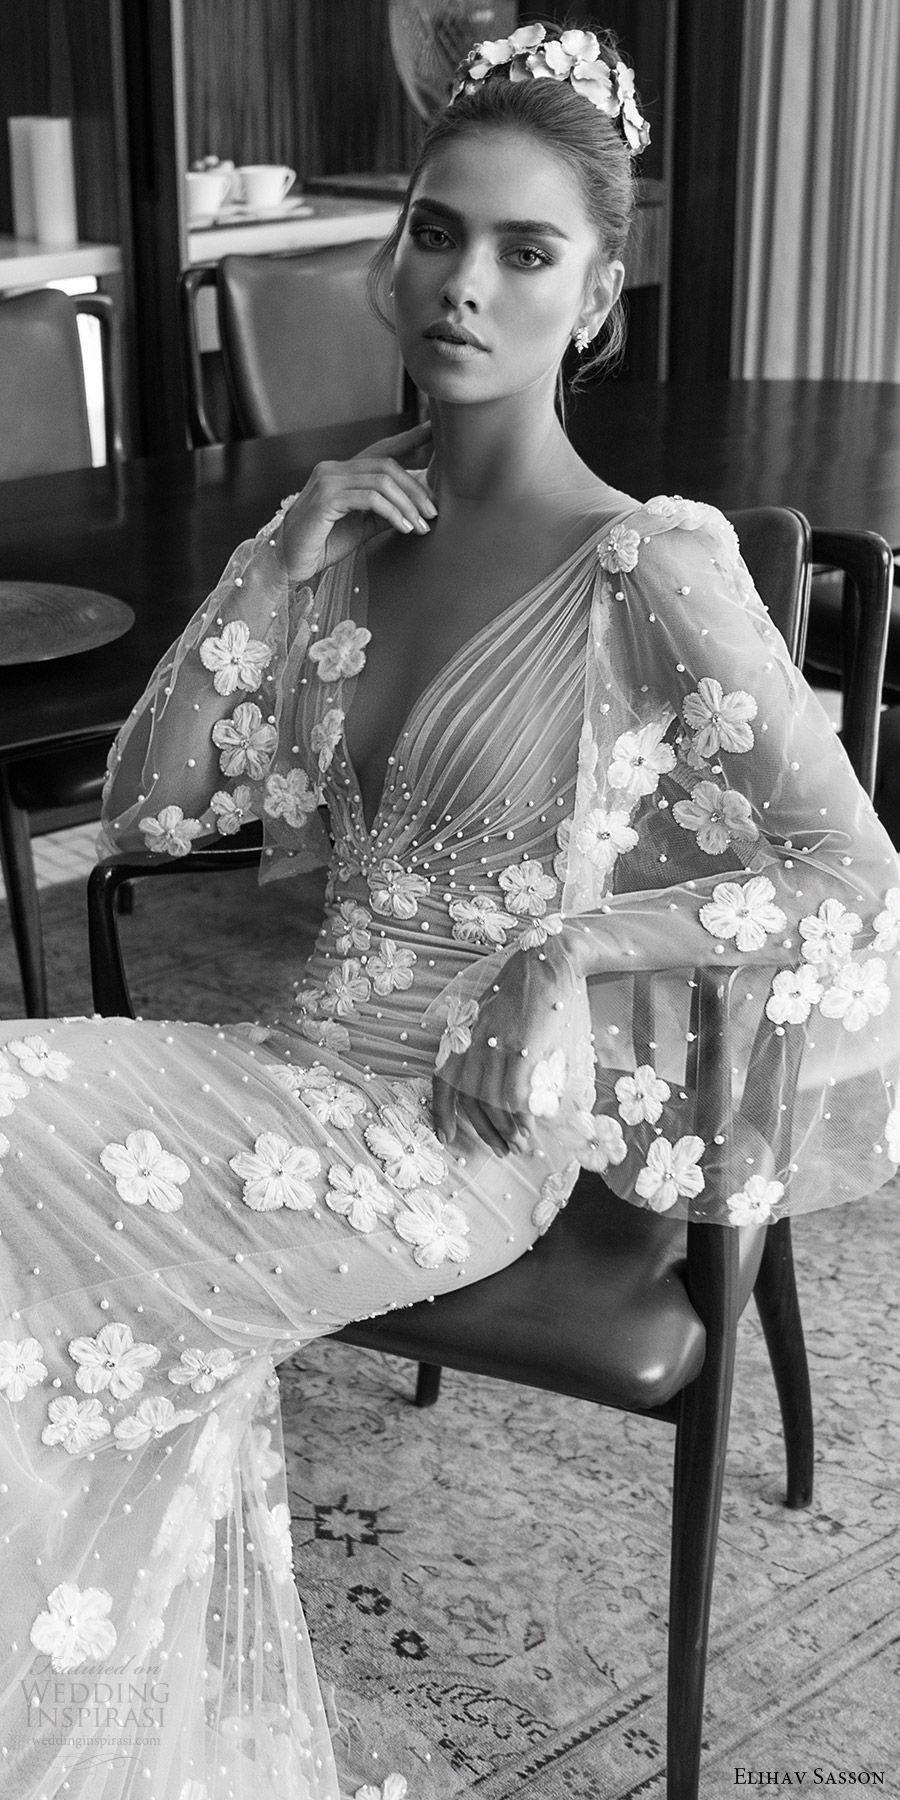 Elihav sasson spring bridal deep v neck illusion bouffant long